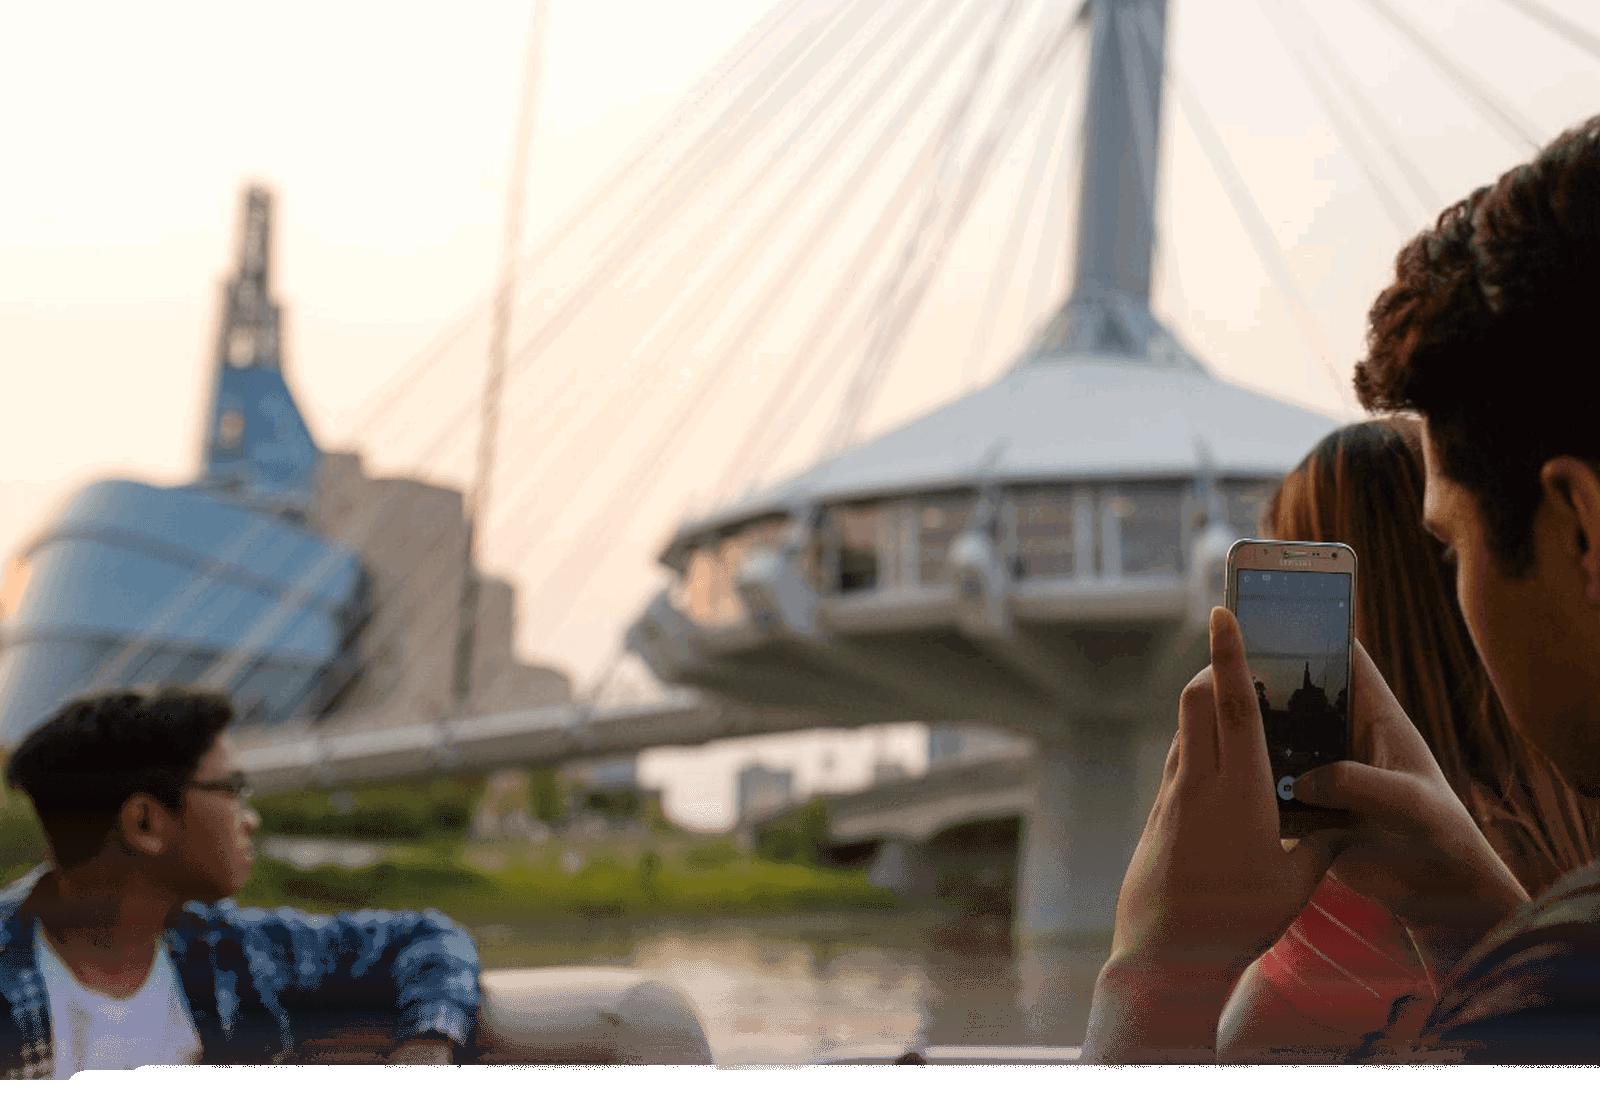 Winnipeg Summer - Festivals, Events, Arts, & Design